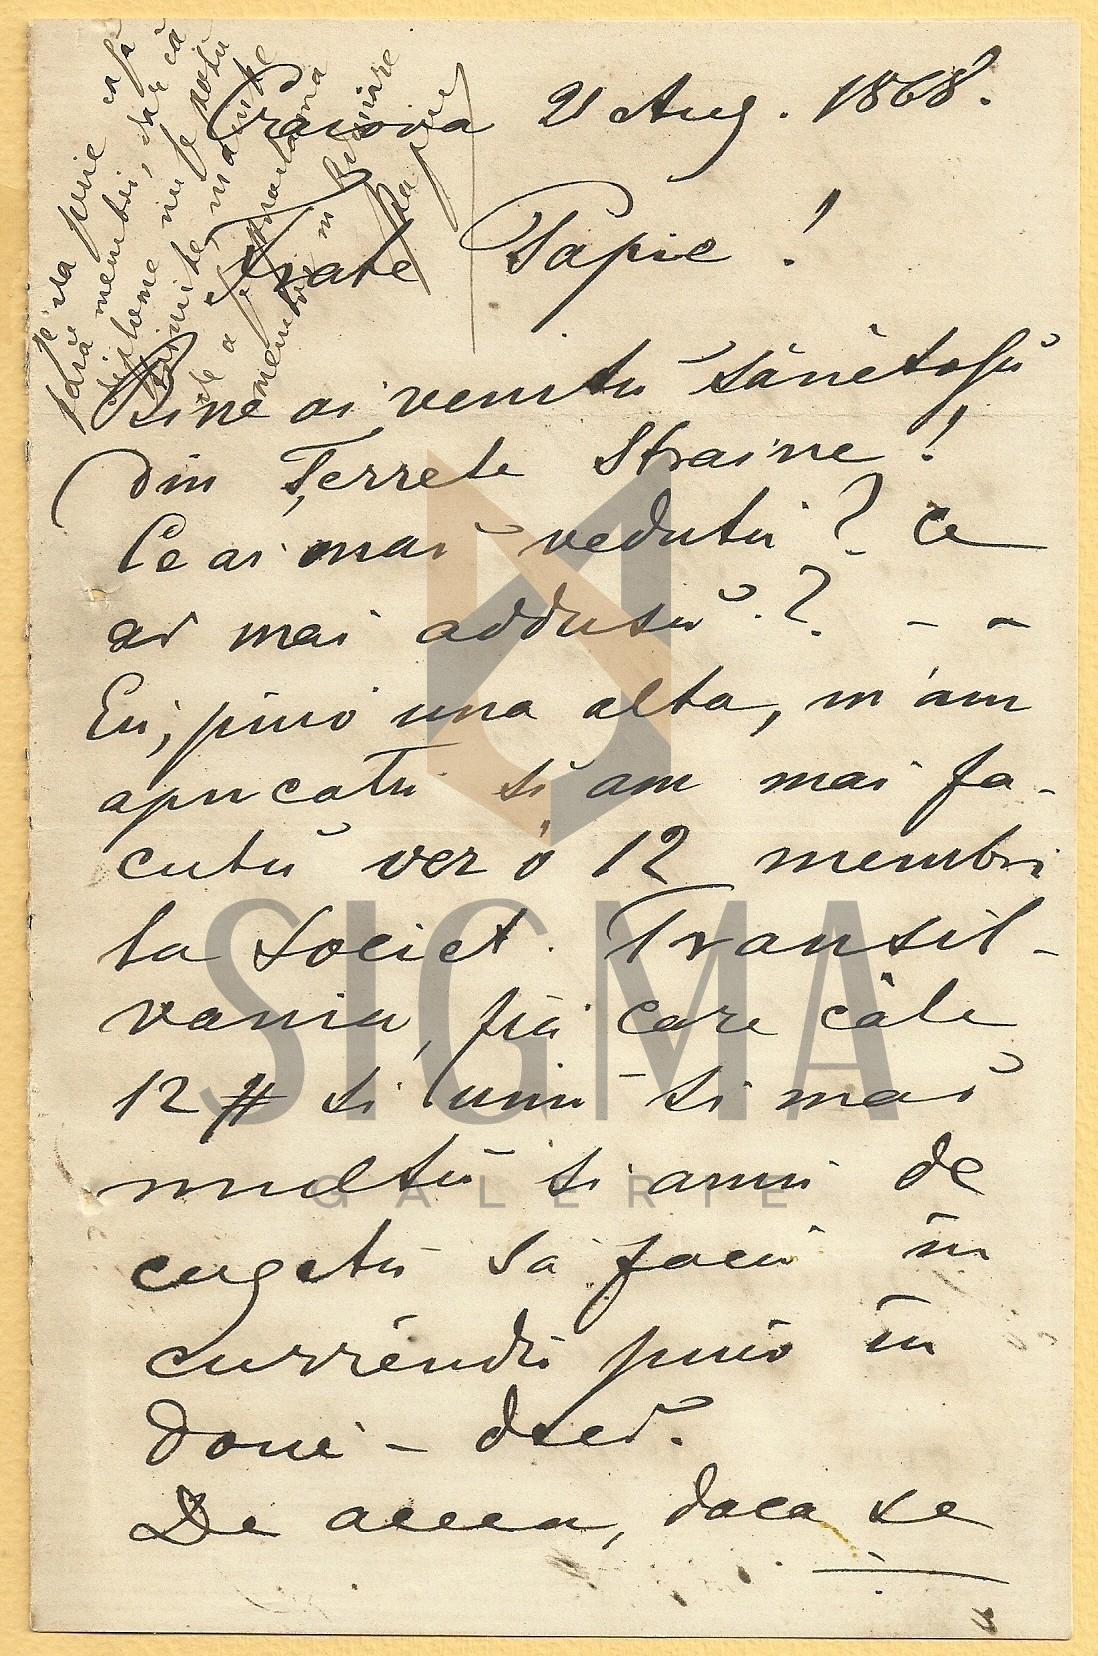 SCRISOARE SOCIETATEA TRANSILVANIA G. CHITU - AL. PAPIU ILARIAN , CRAIOVA 1868